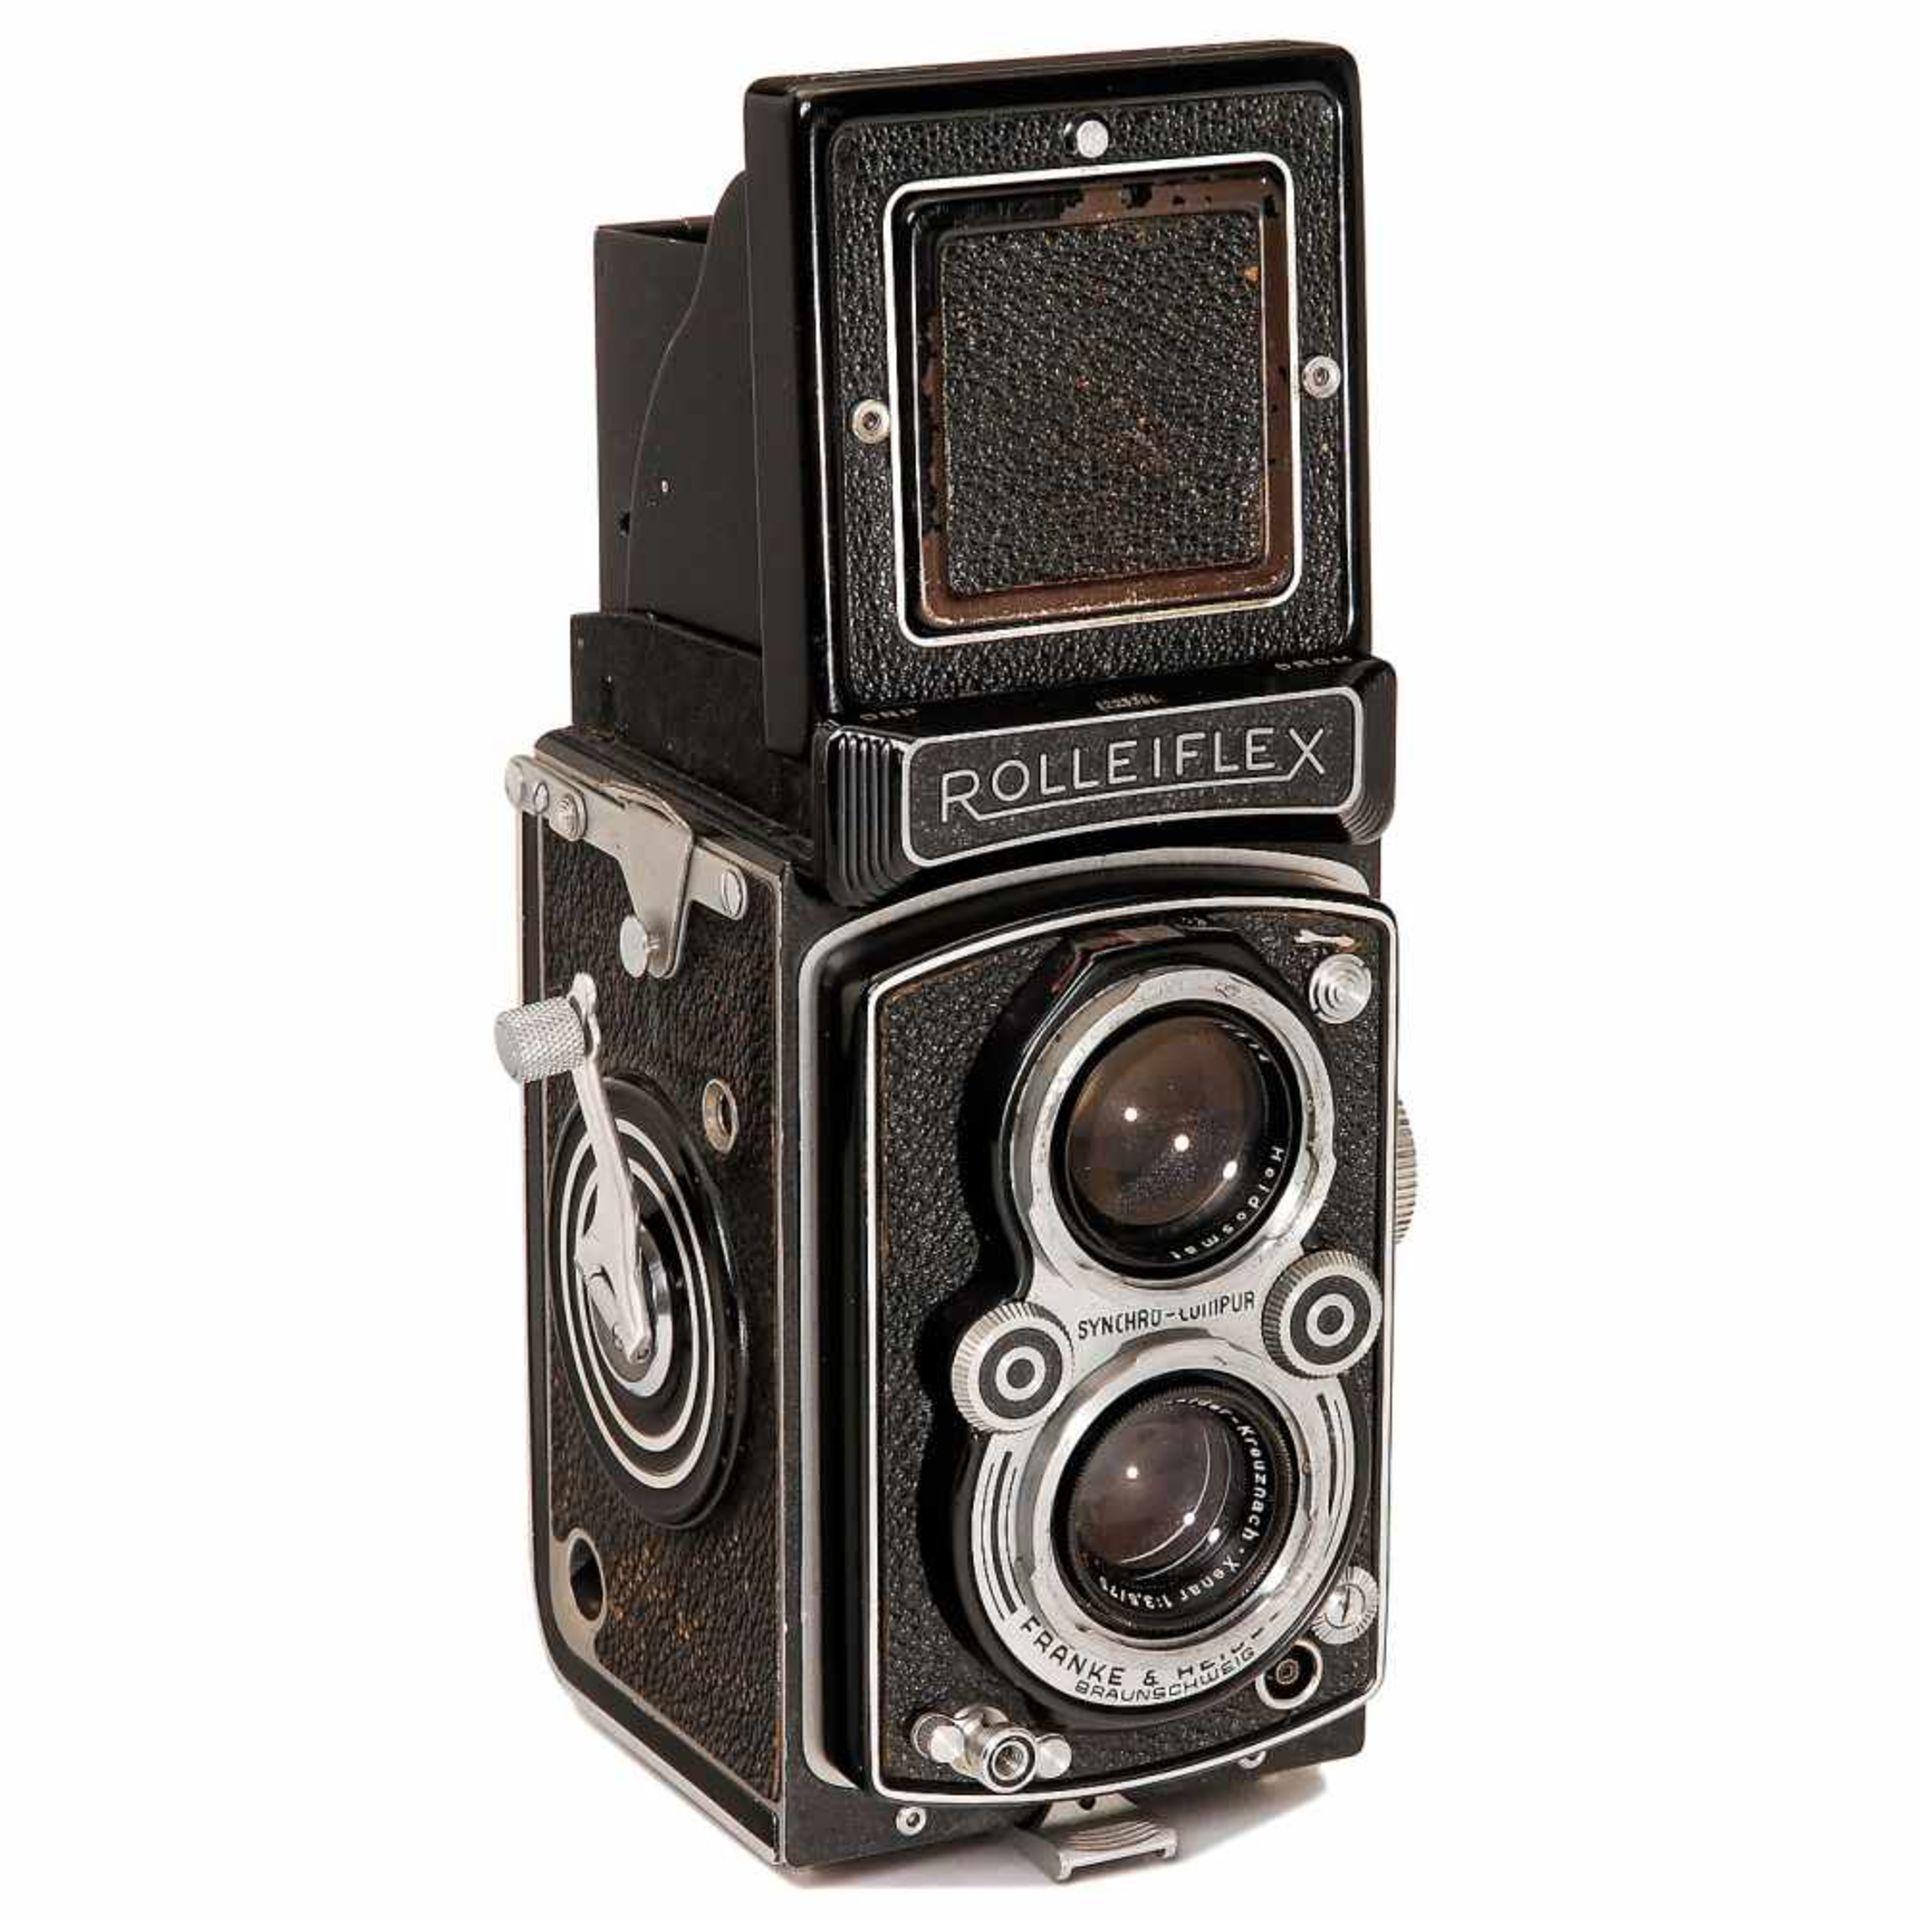 "Rolleiflex 3,5A ""Xenar"", 1951Franke & Heidecke, Braunschweig. No. 1223351, Xenar 3,5/75 mm in"